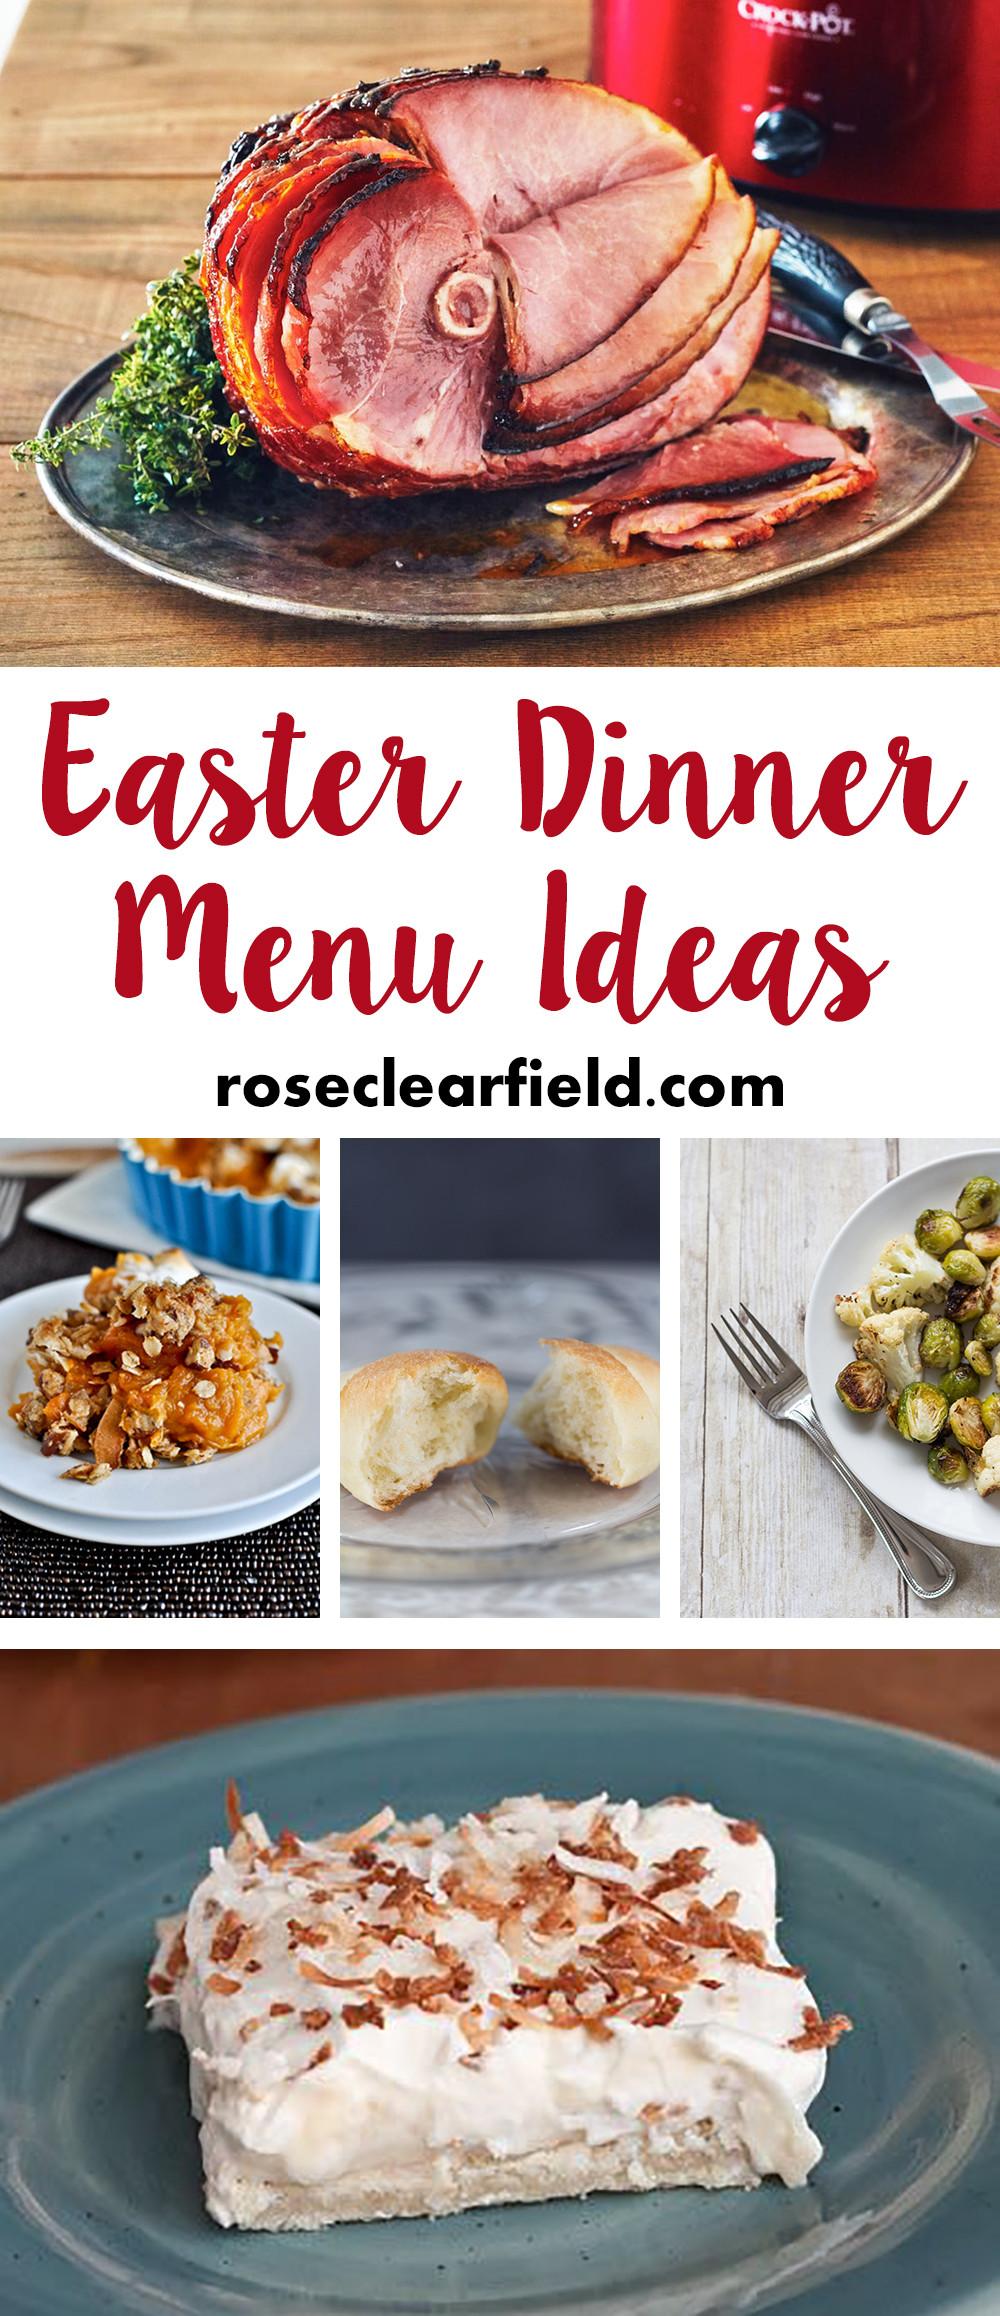 Menu For Easter Dinner  Easter Dinner Menu Ideas • Rose Clearfield